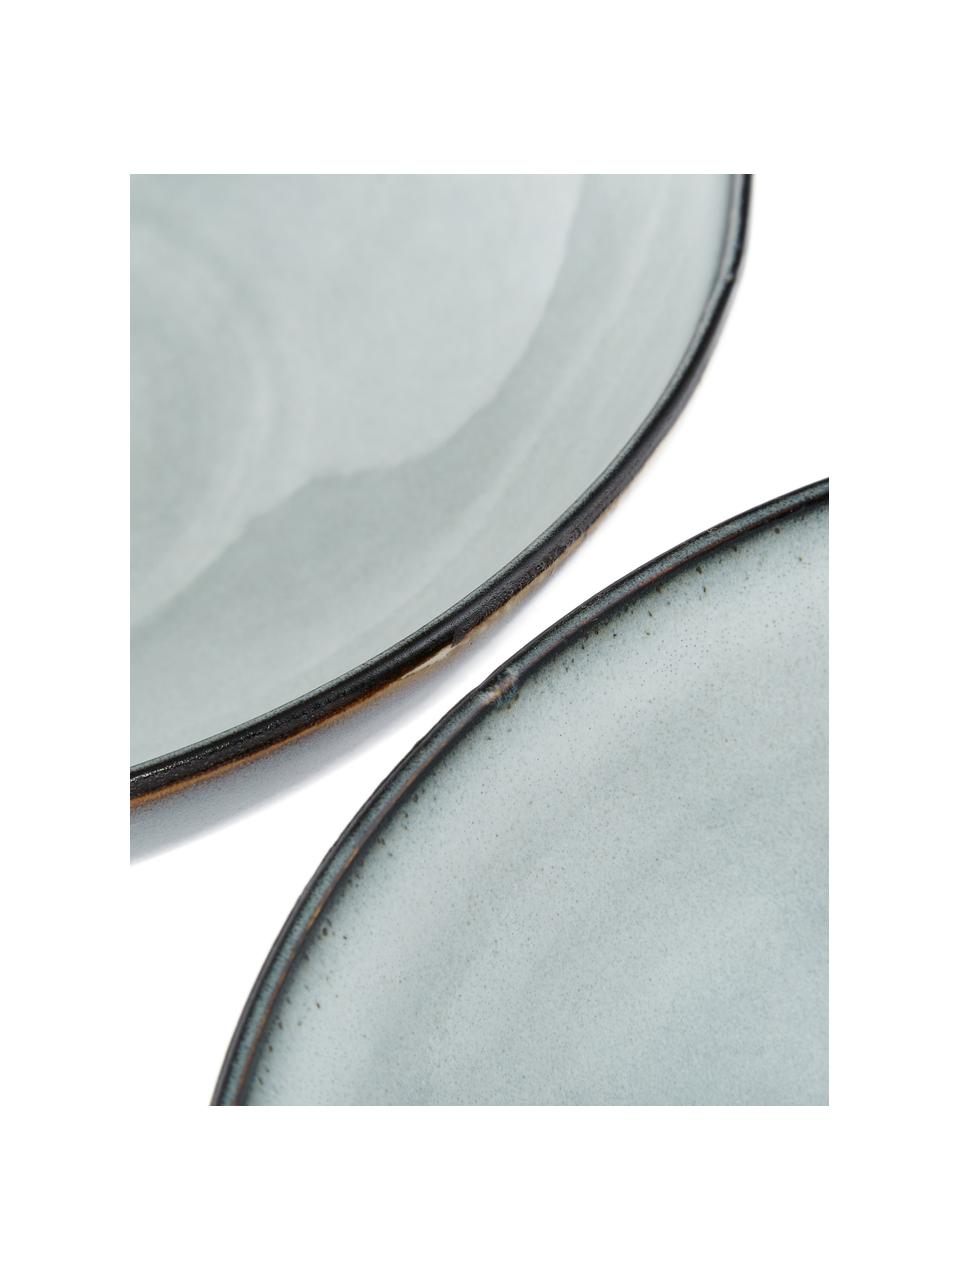 Ciotola fatta a mano Thalia 2 pz, Terracotta, Grigio, Ø 22 x Alt. 6 cm